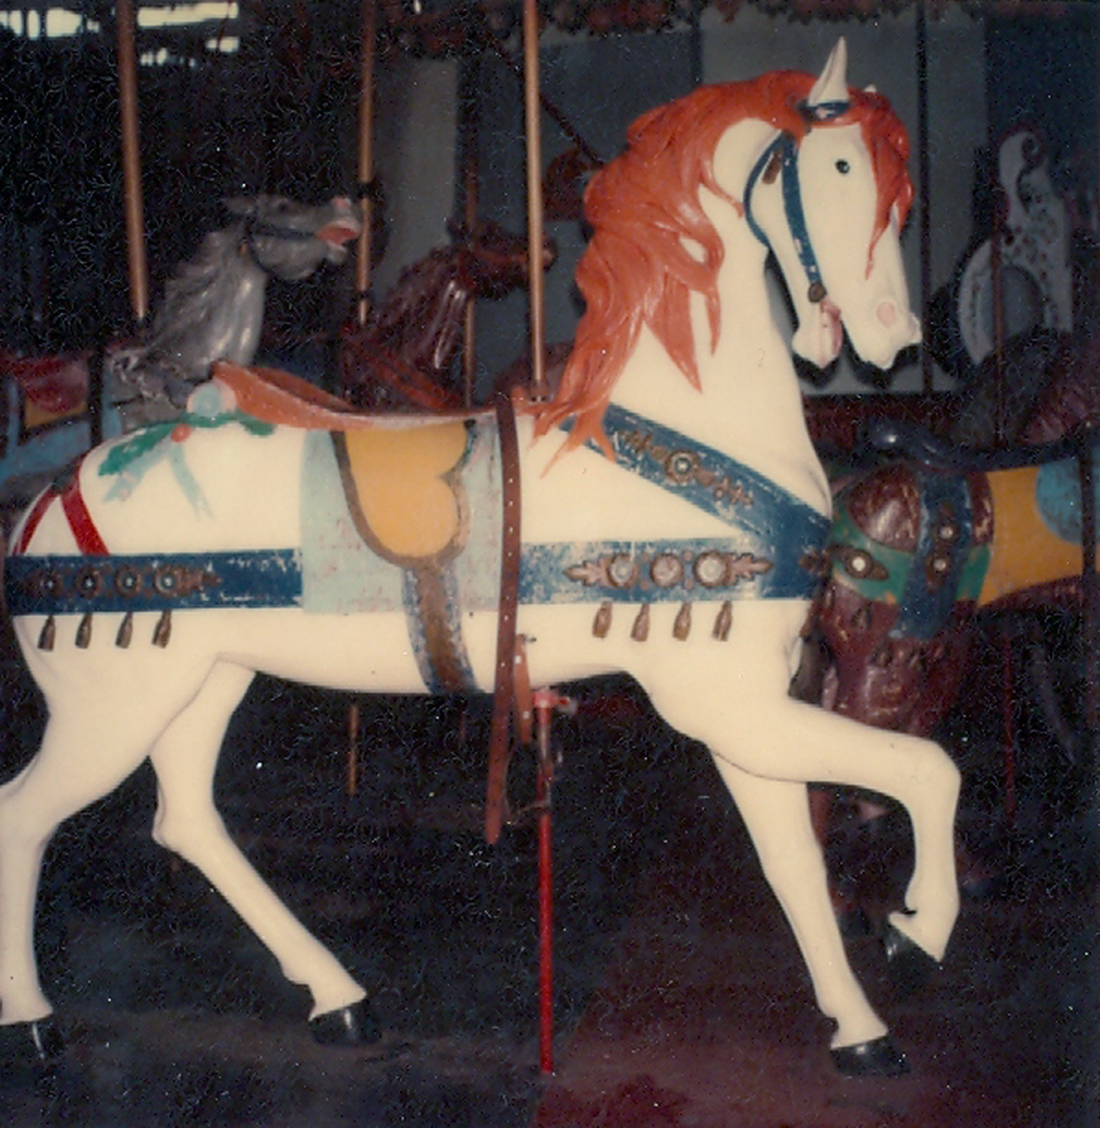 Salem-Willows-MA-ca-1905-Looff-carousel-horse-101